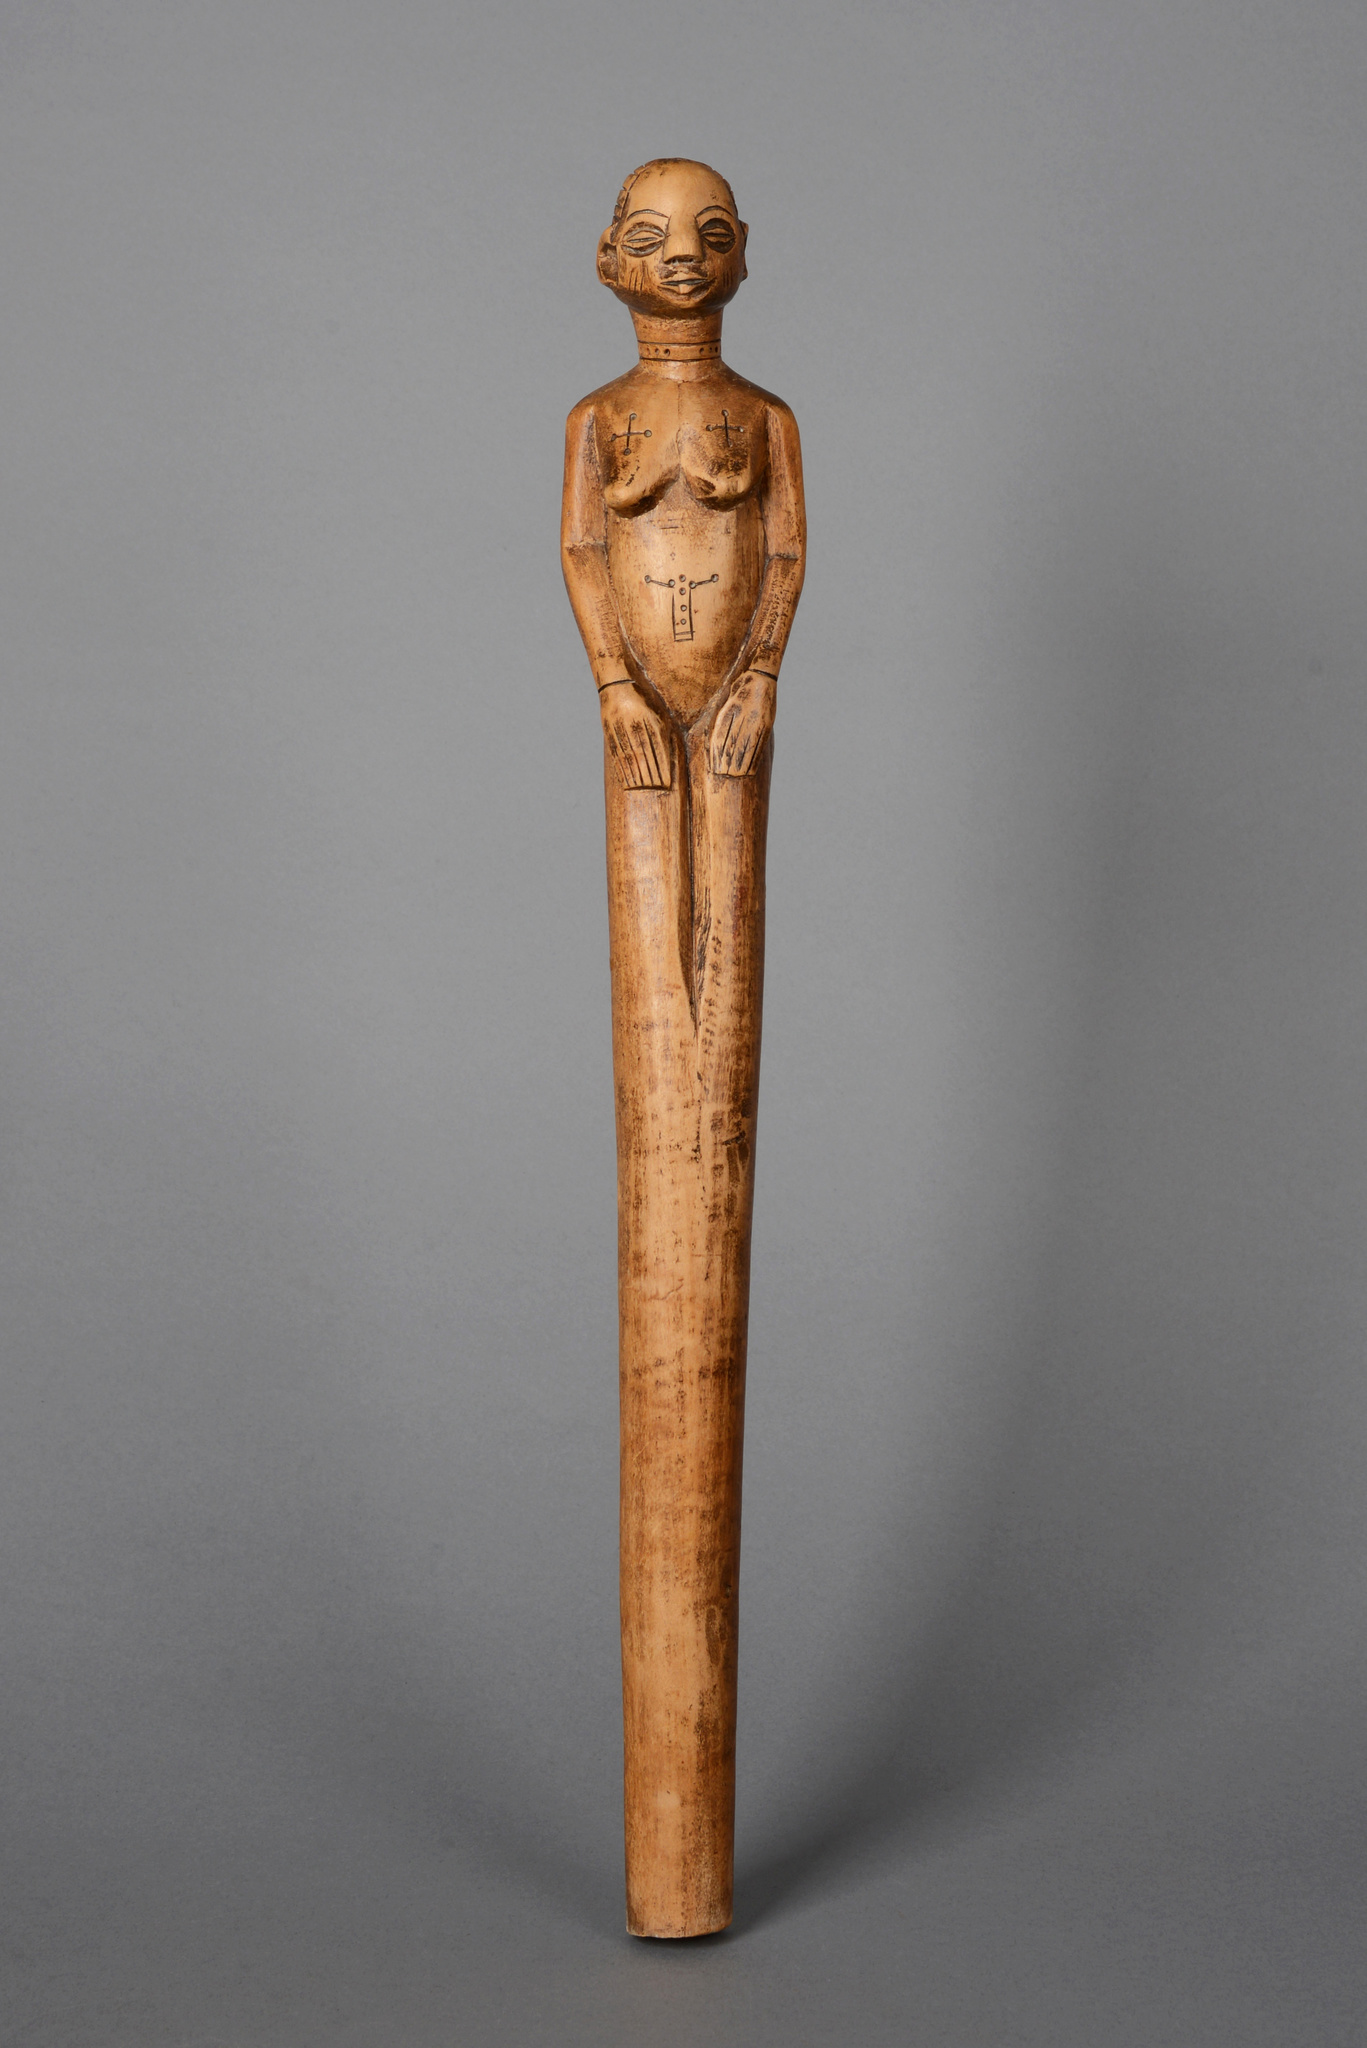 Figural beschnitzter Stab